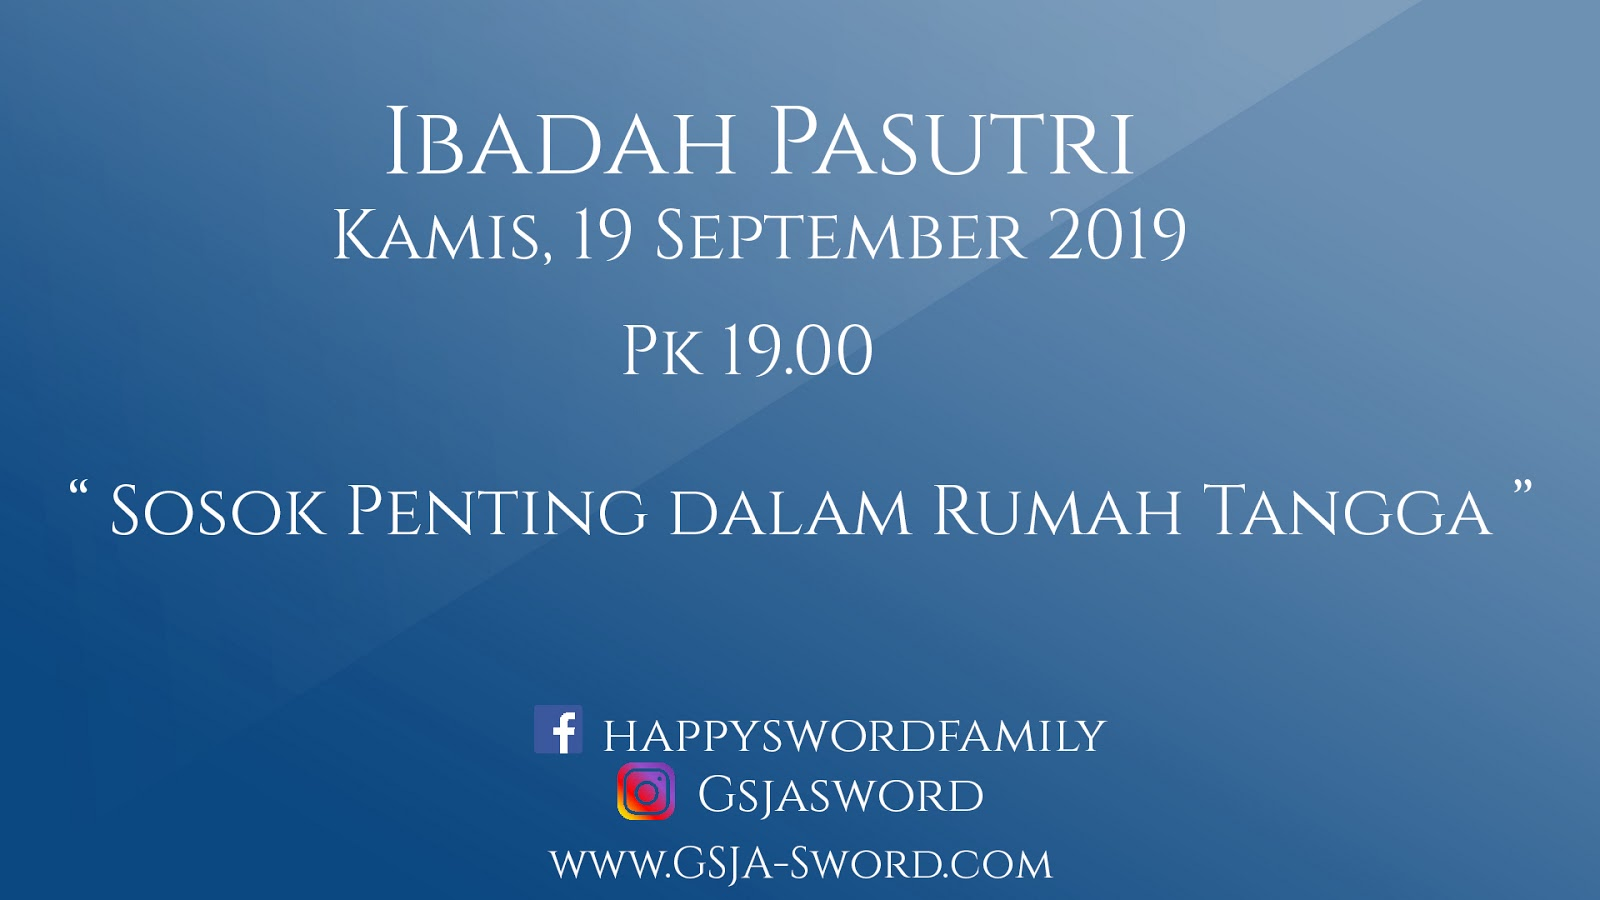 Ibadah Pasutri GSJA Sword 19 September 2019 Jam 19.00 WIB